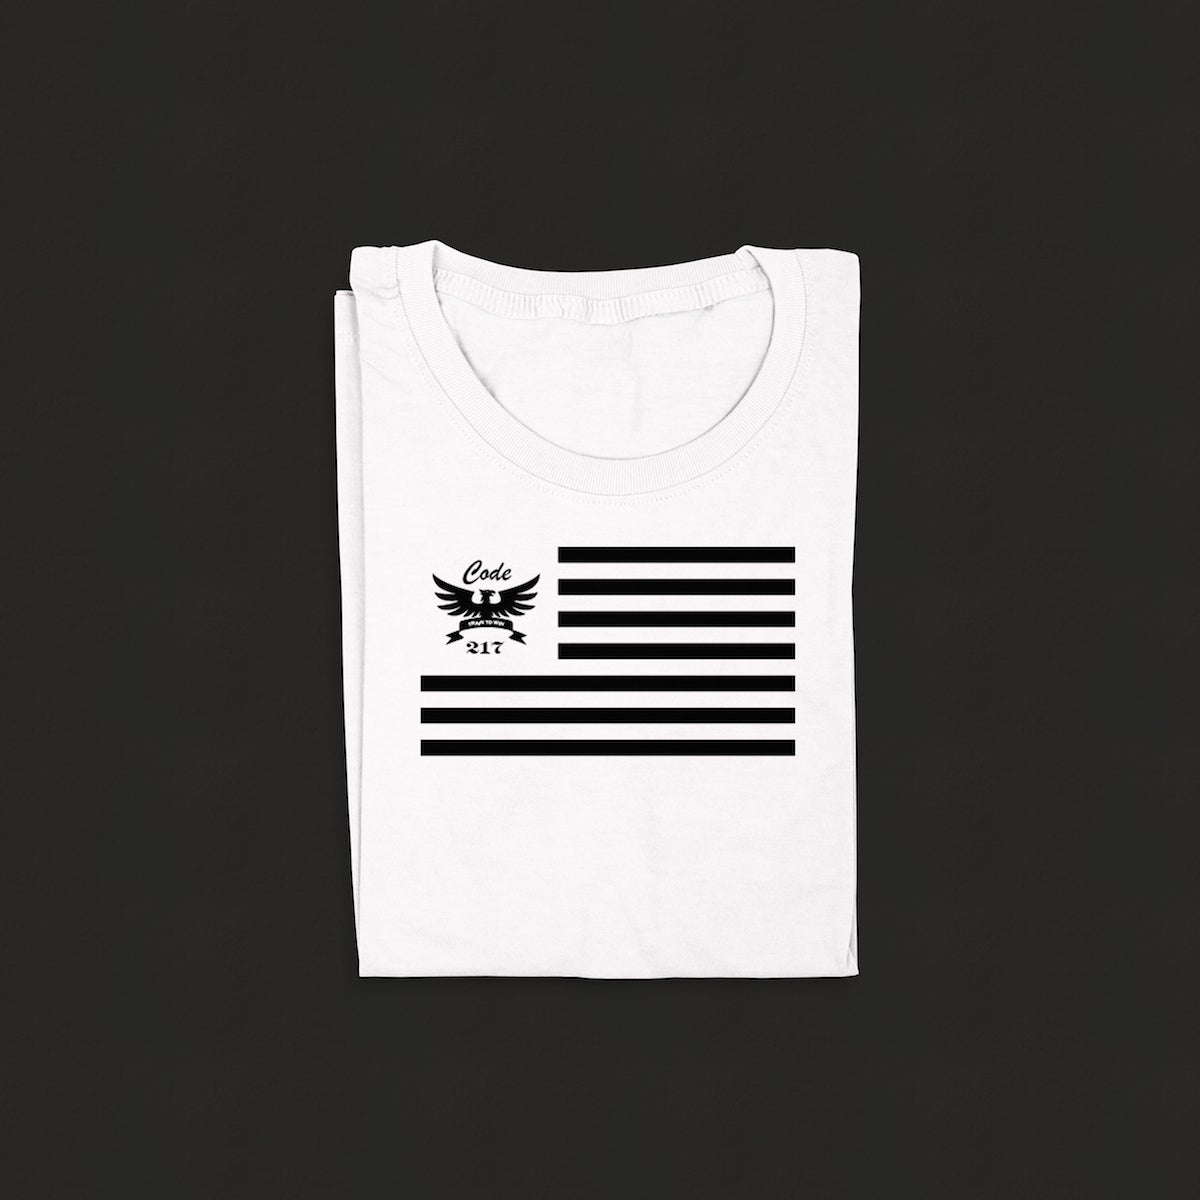 Image of 217 Flag T-Shirt